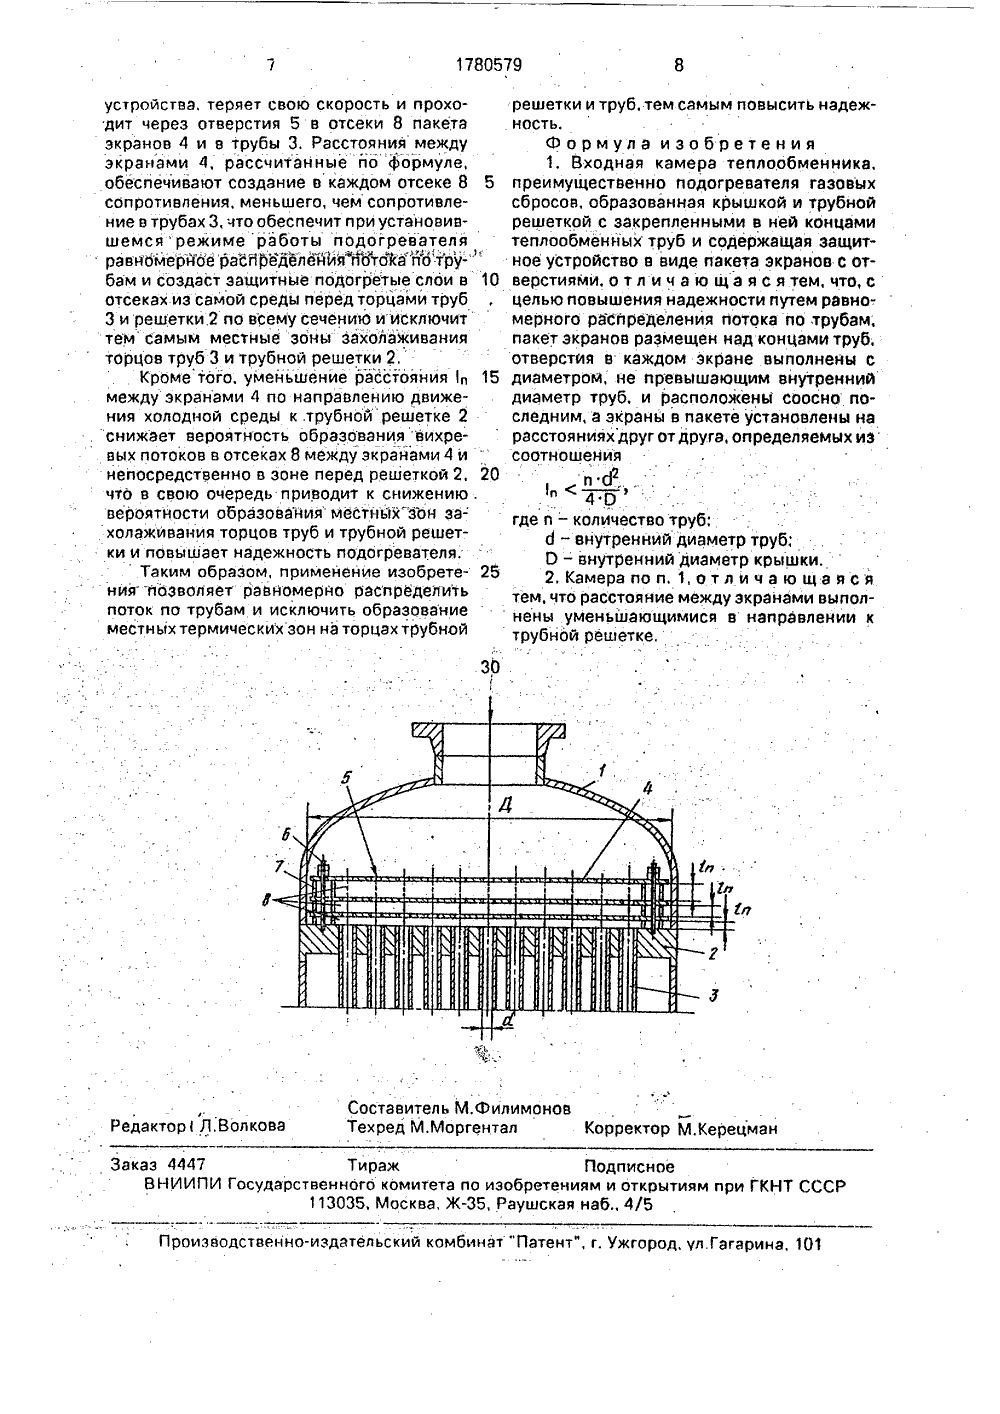 Камера теплообменника Уплотнения теплообменника Sondex SG56 Мурманск